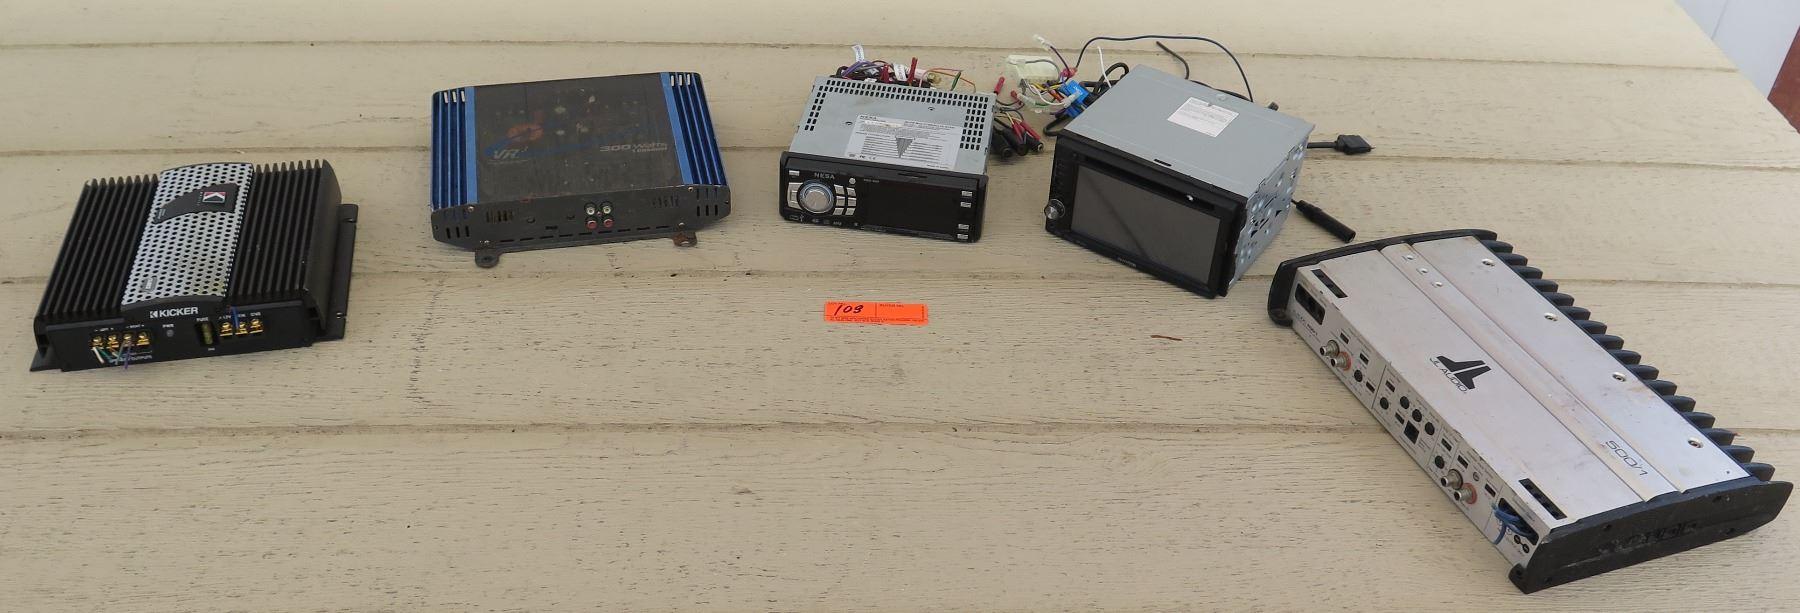 car audio kenwood dvd car deck, nesa multi media car deck 4 channel amp wiring diagram how to install a car amplifier